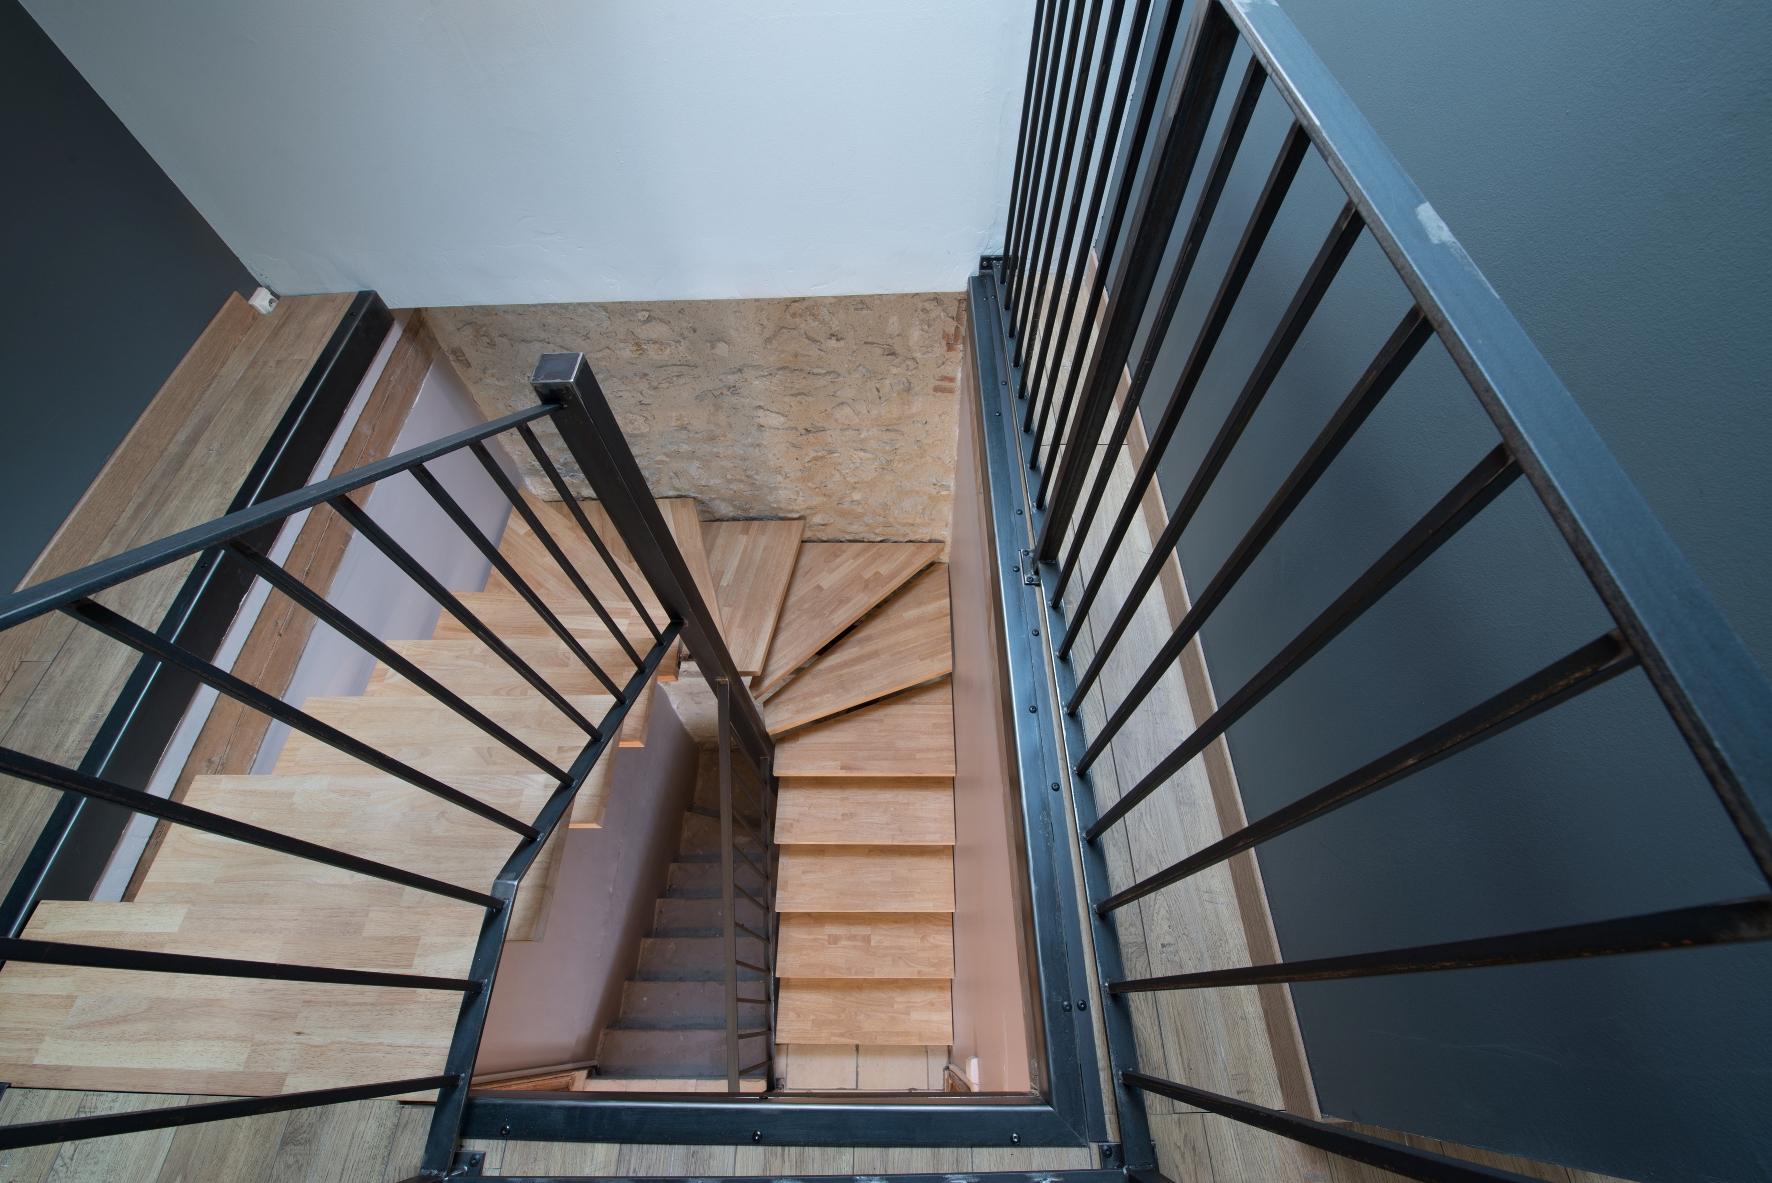 Escalier Jach fer 03.jpg